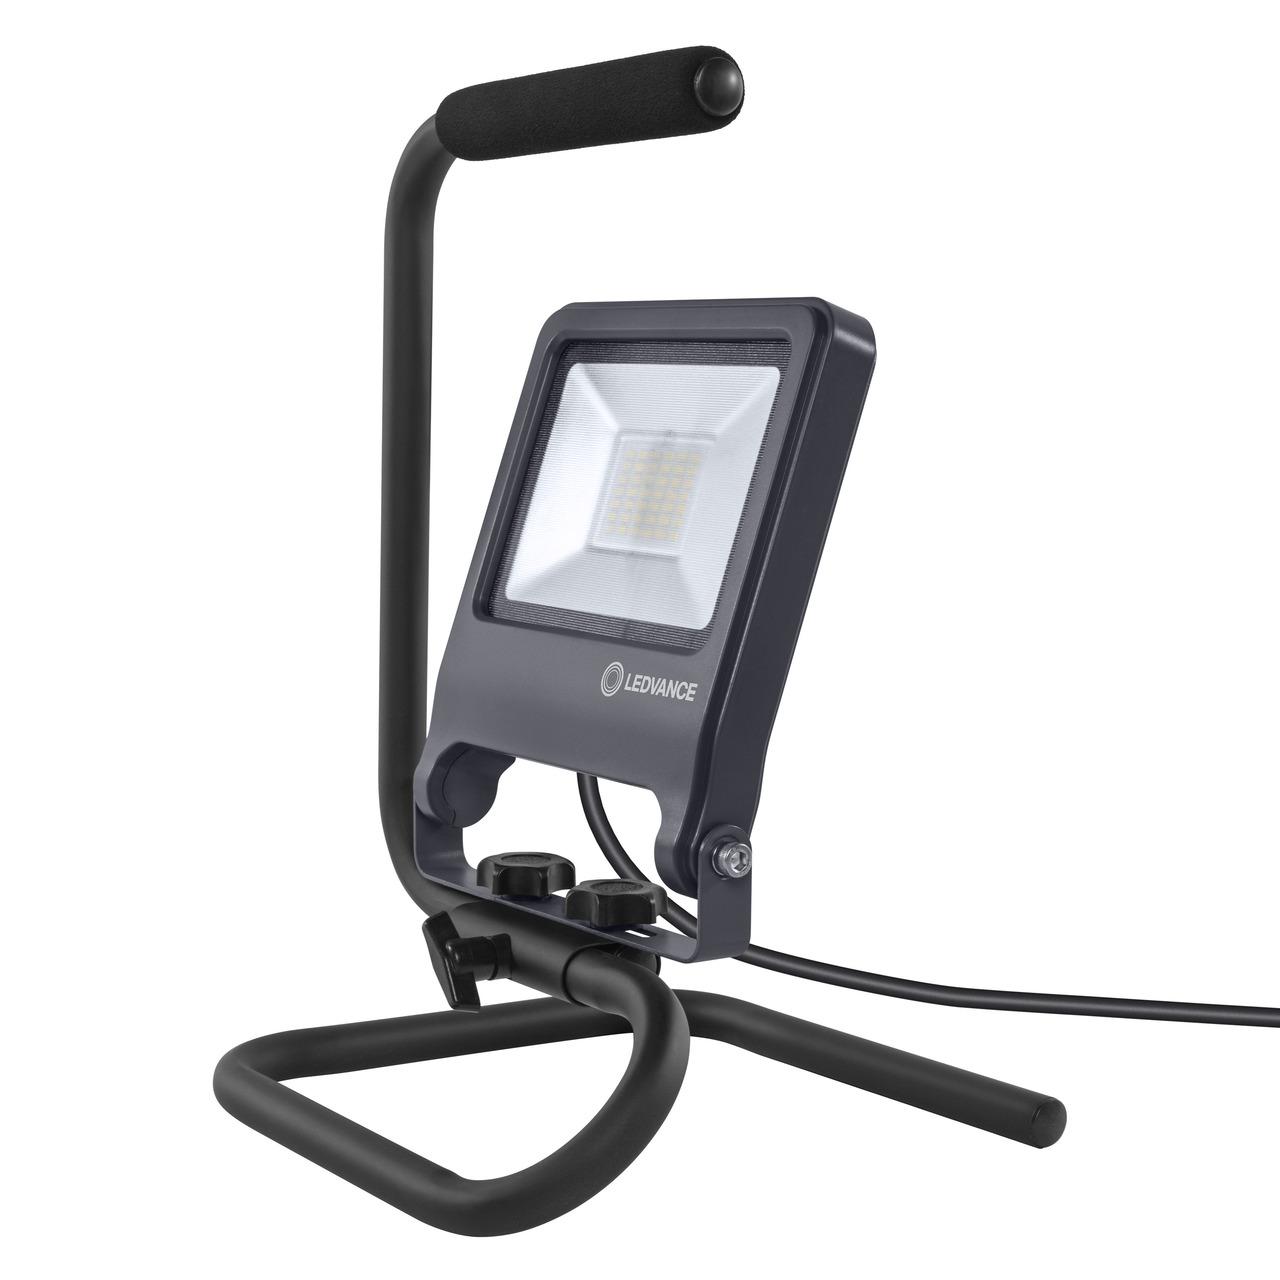 Ledvance 30-W-LED-Arbeitsleuchte Worklight S-STAND- 2700 lm- 4000 K- schwarz- IP65